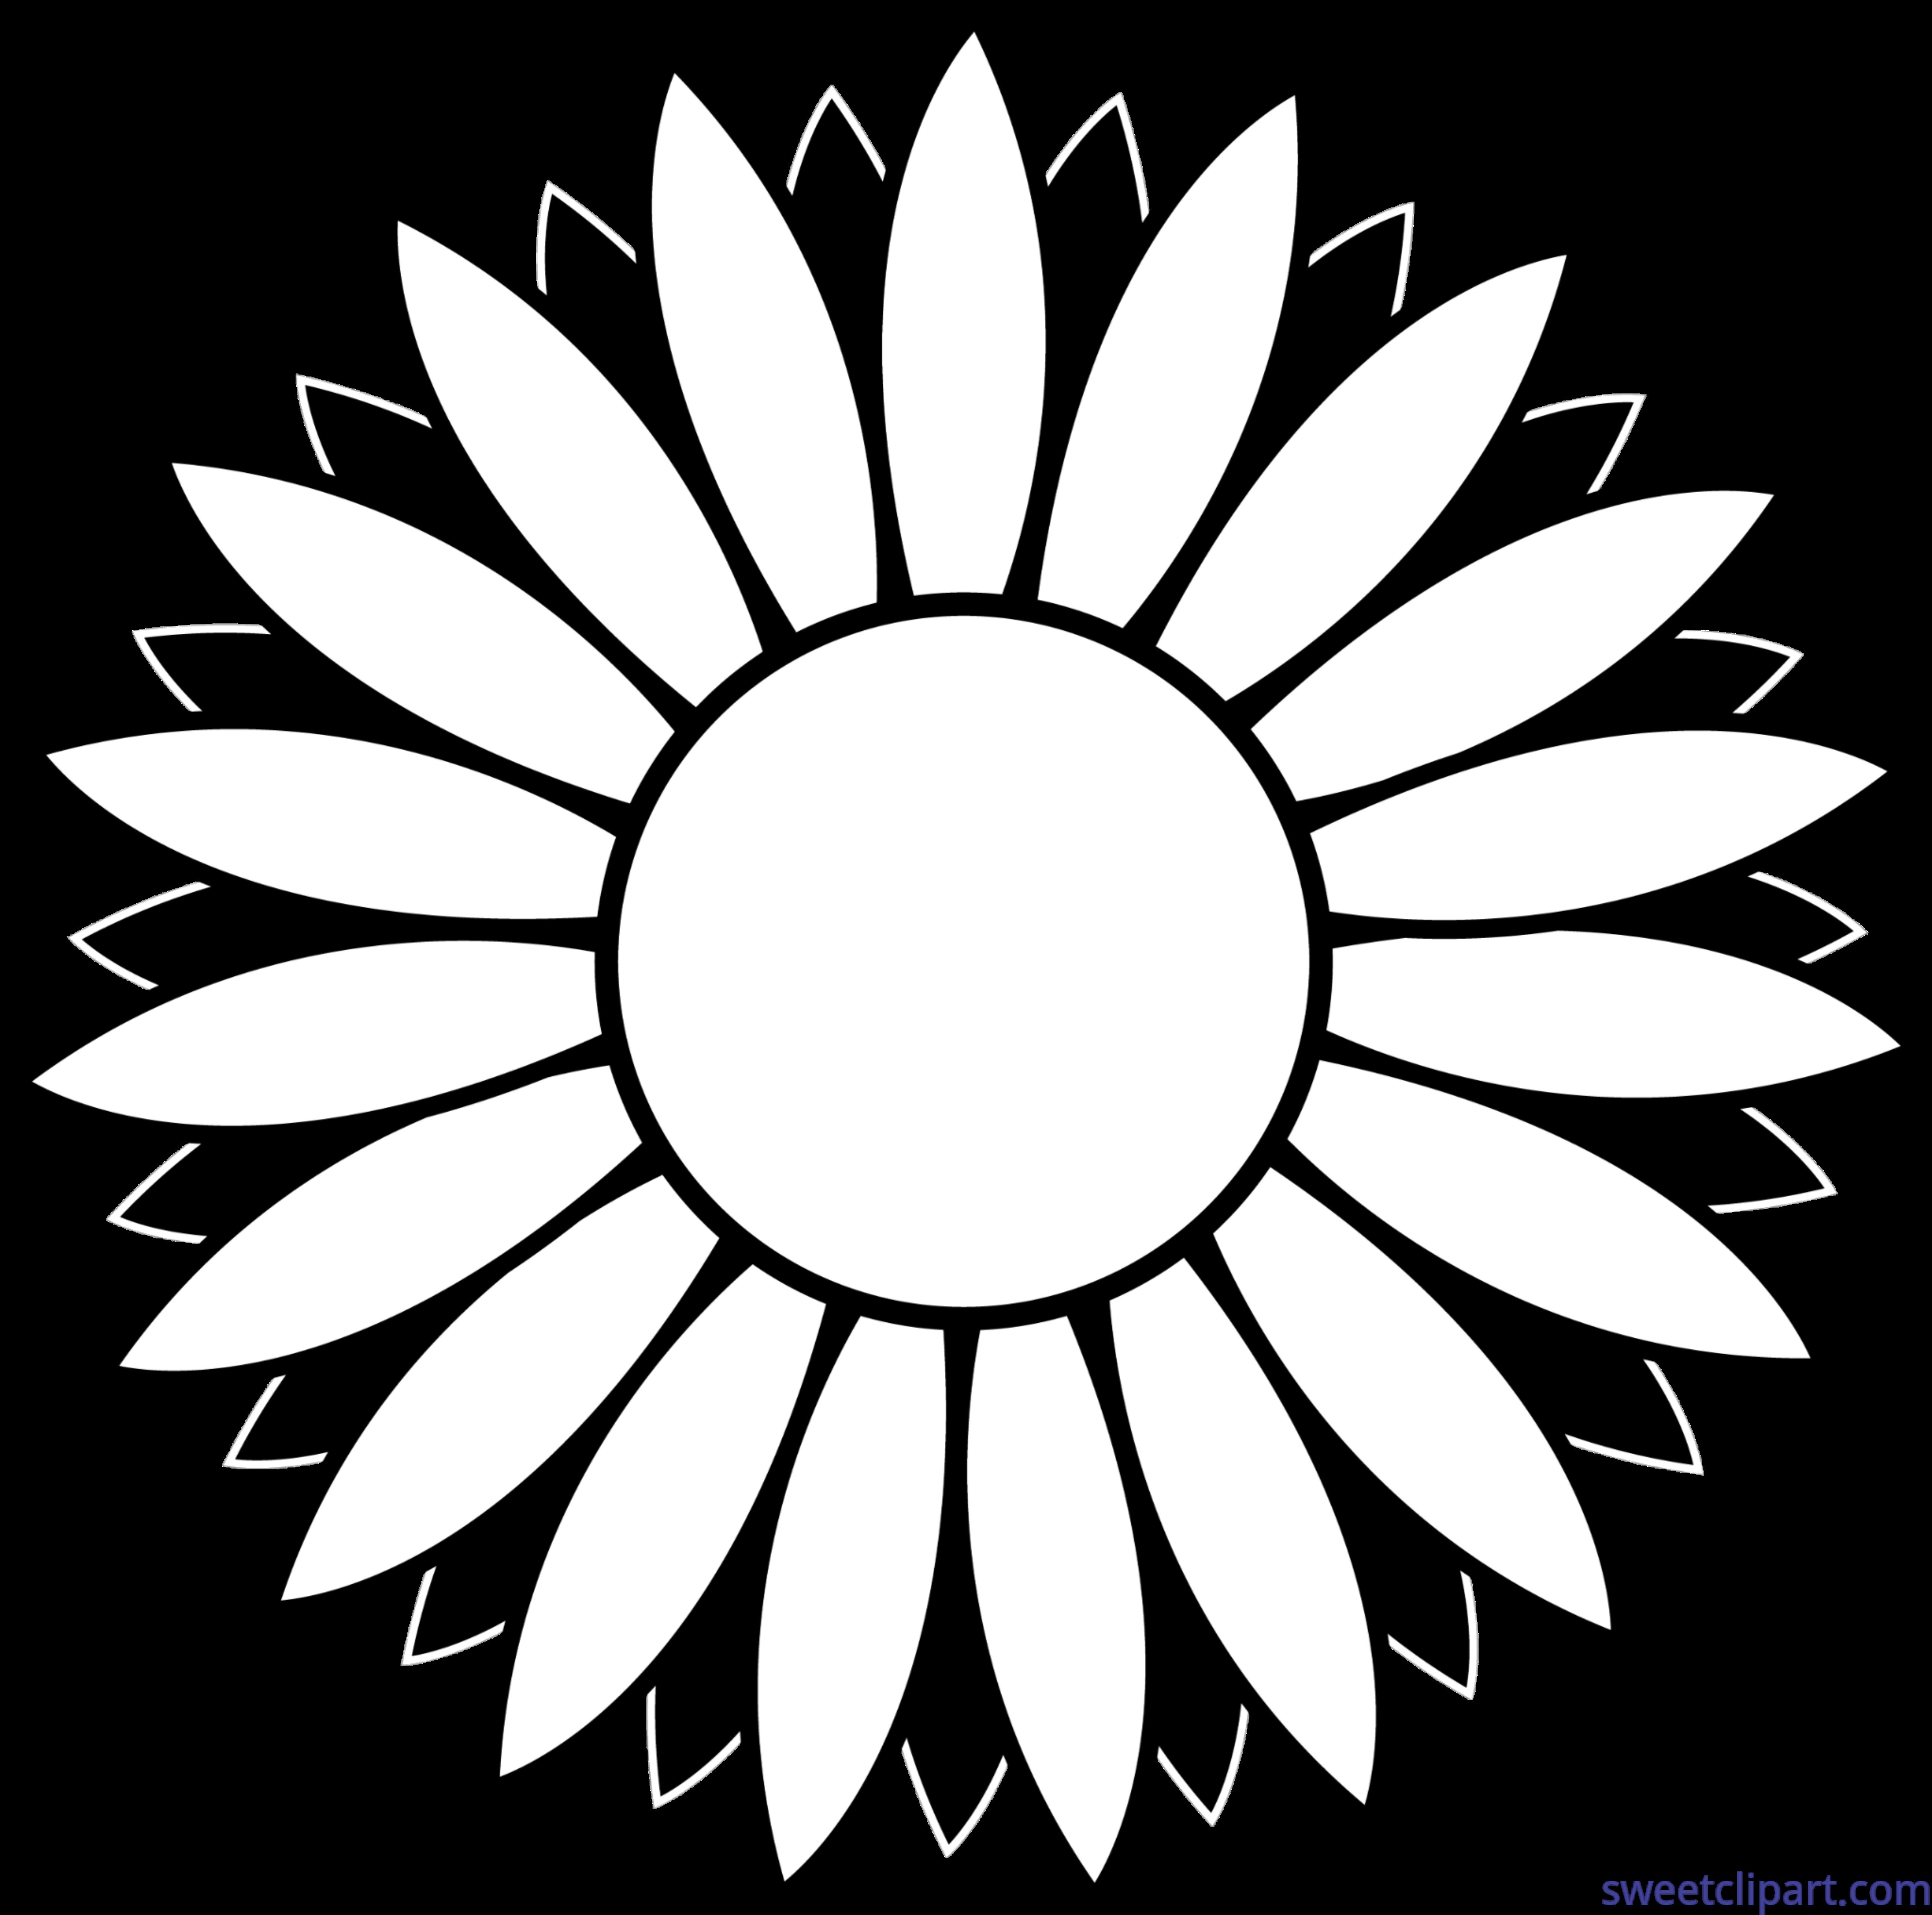 White clipart flower vector black and white download Flower Sunflower Black And White Lineart Clip Art - Sweet Clip Art vector black and white download